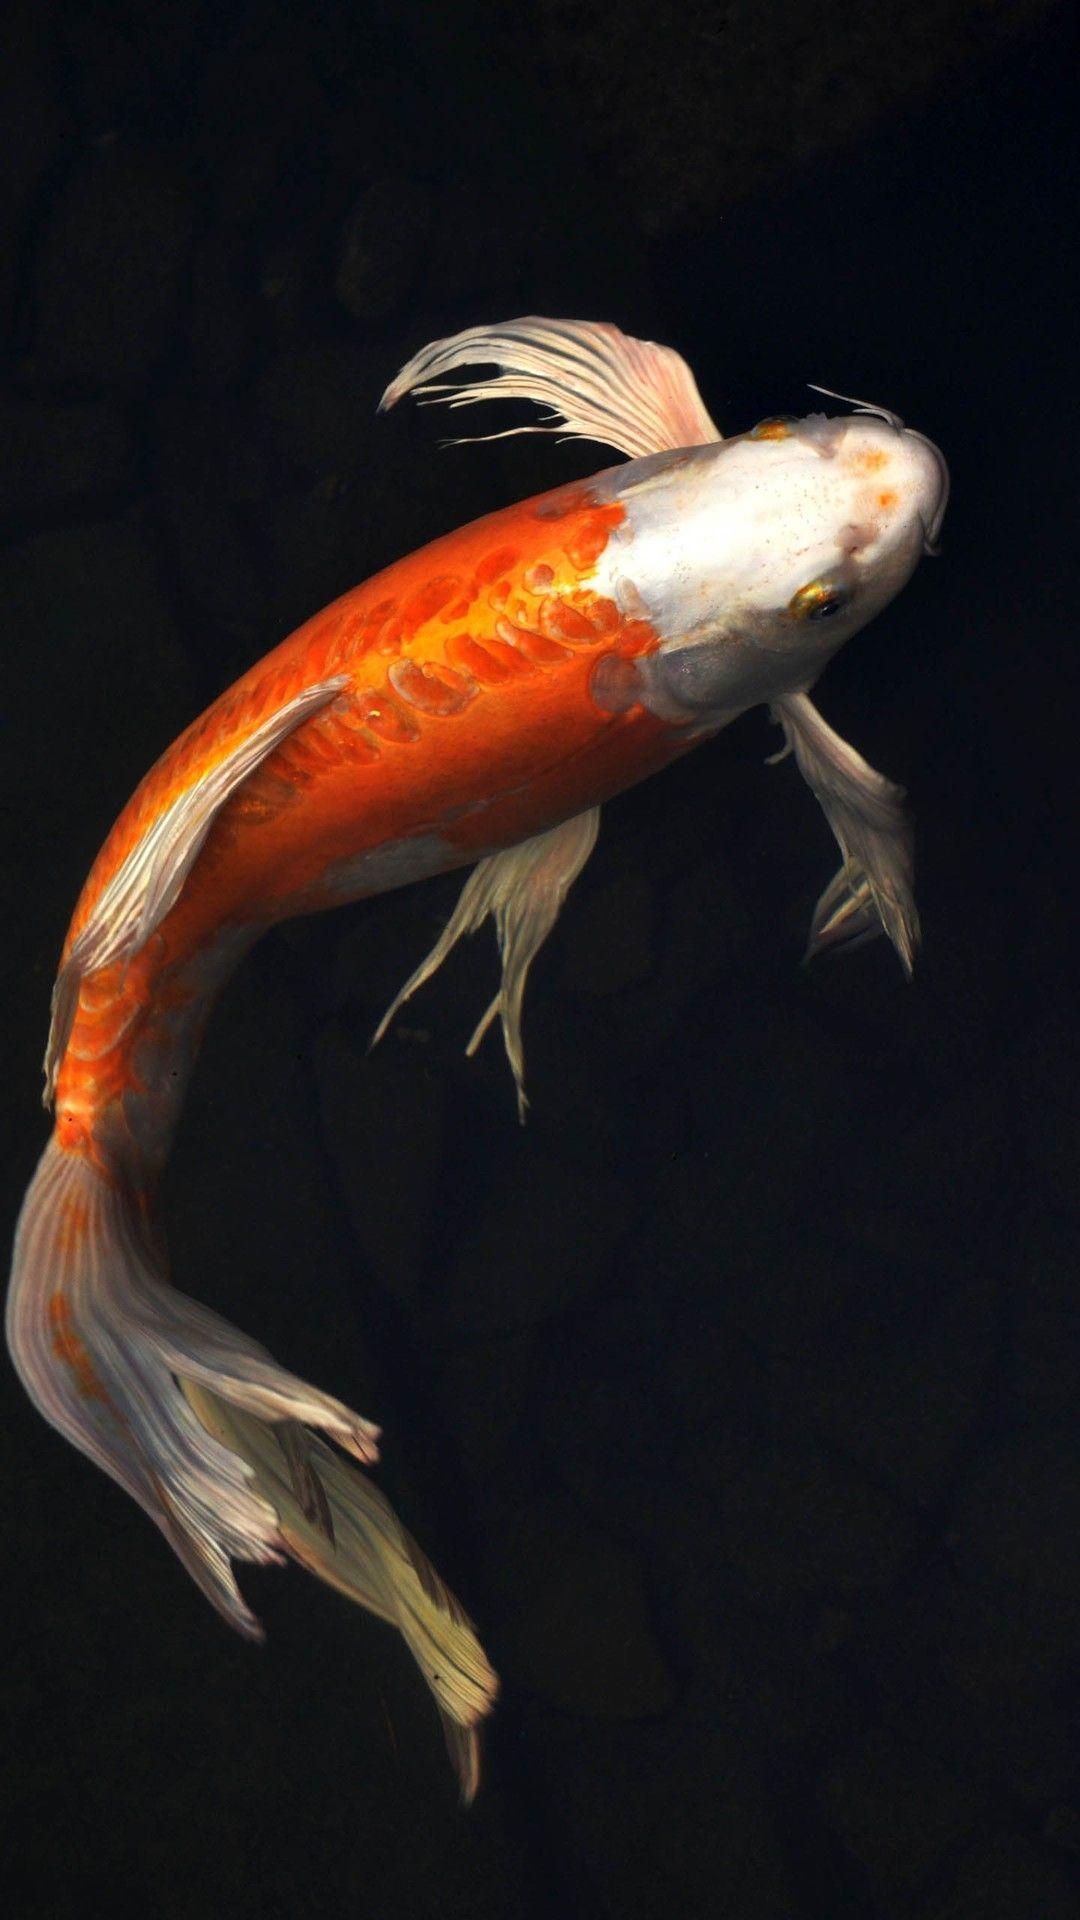 Fish Clean iPhone xs wallpaper download